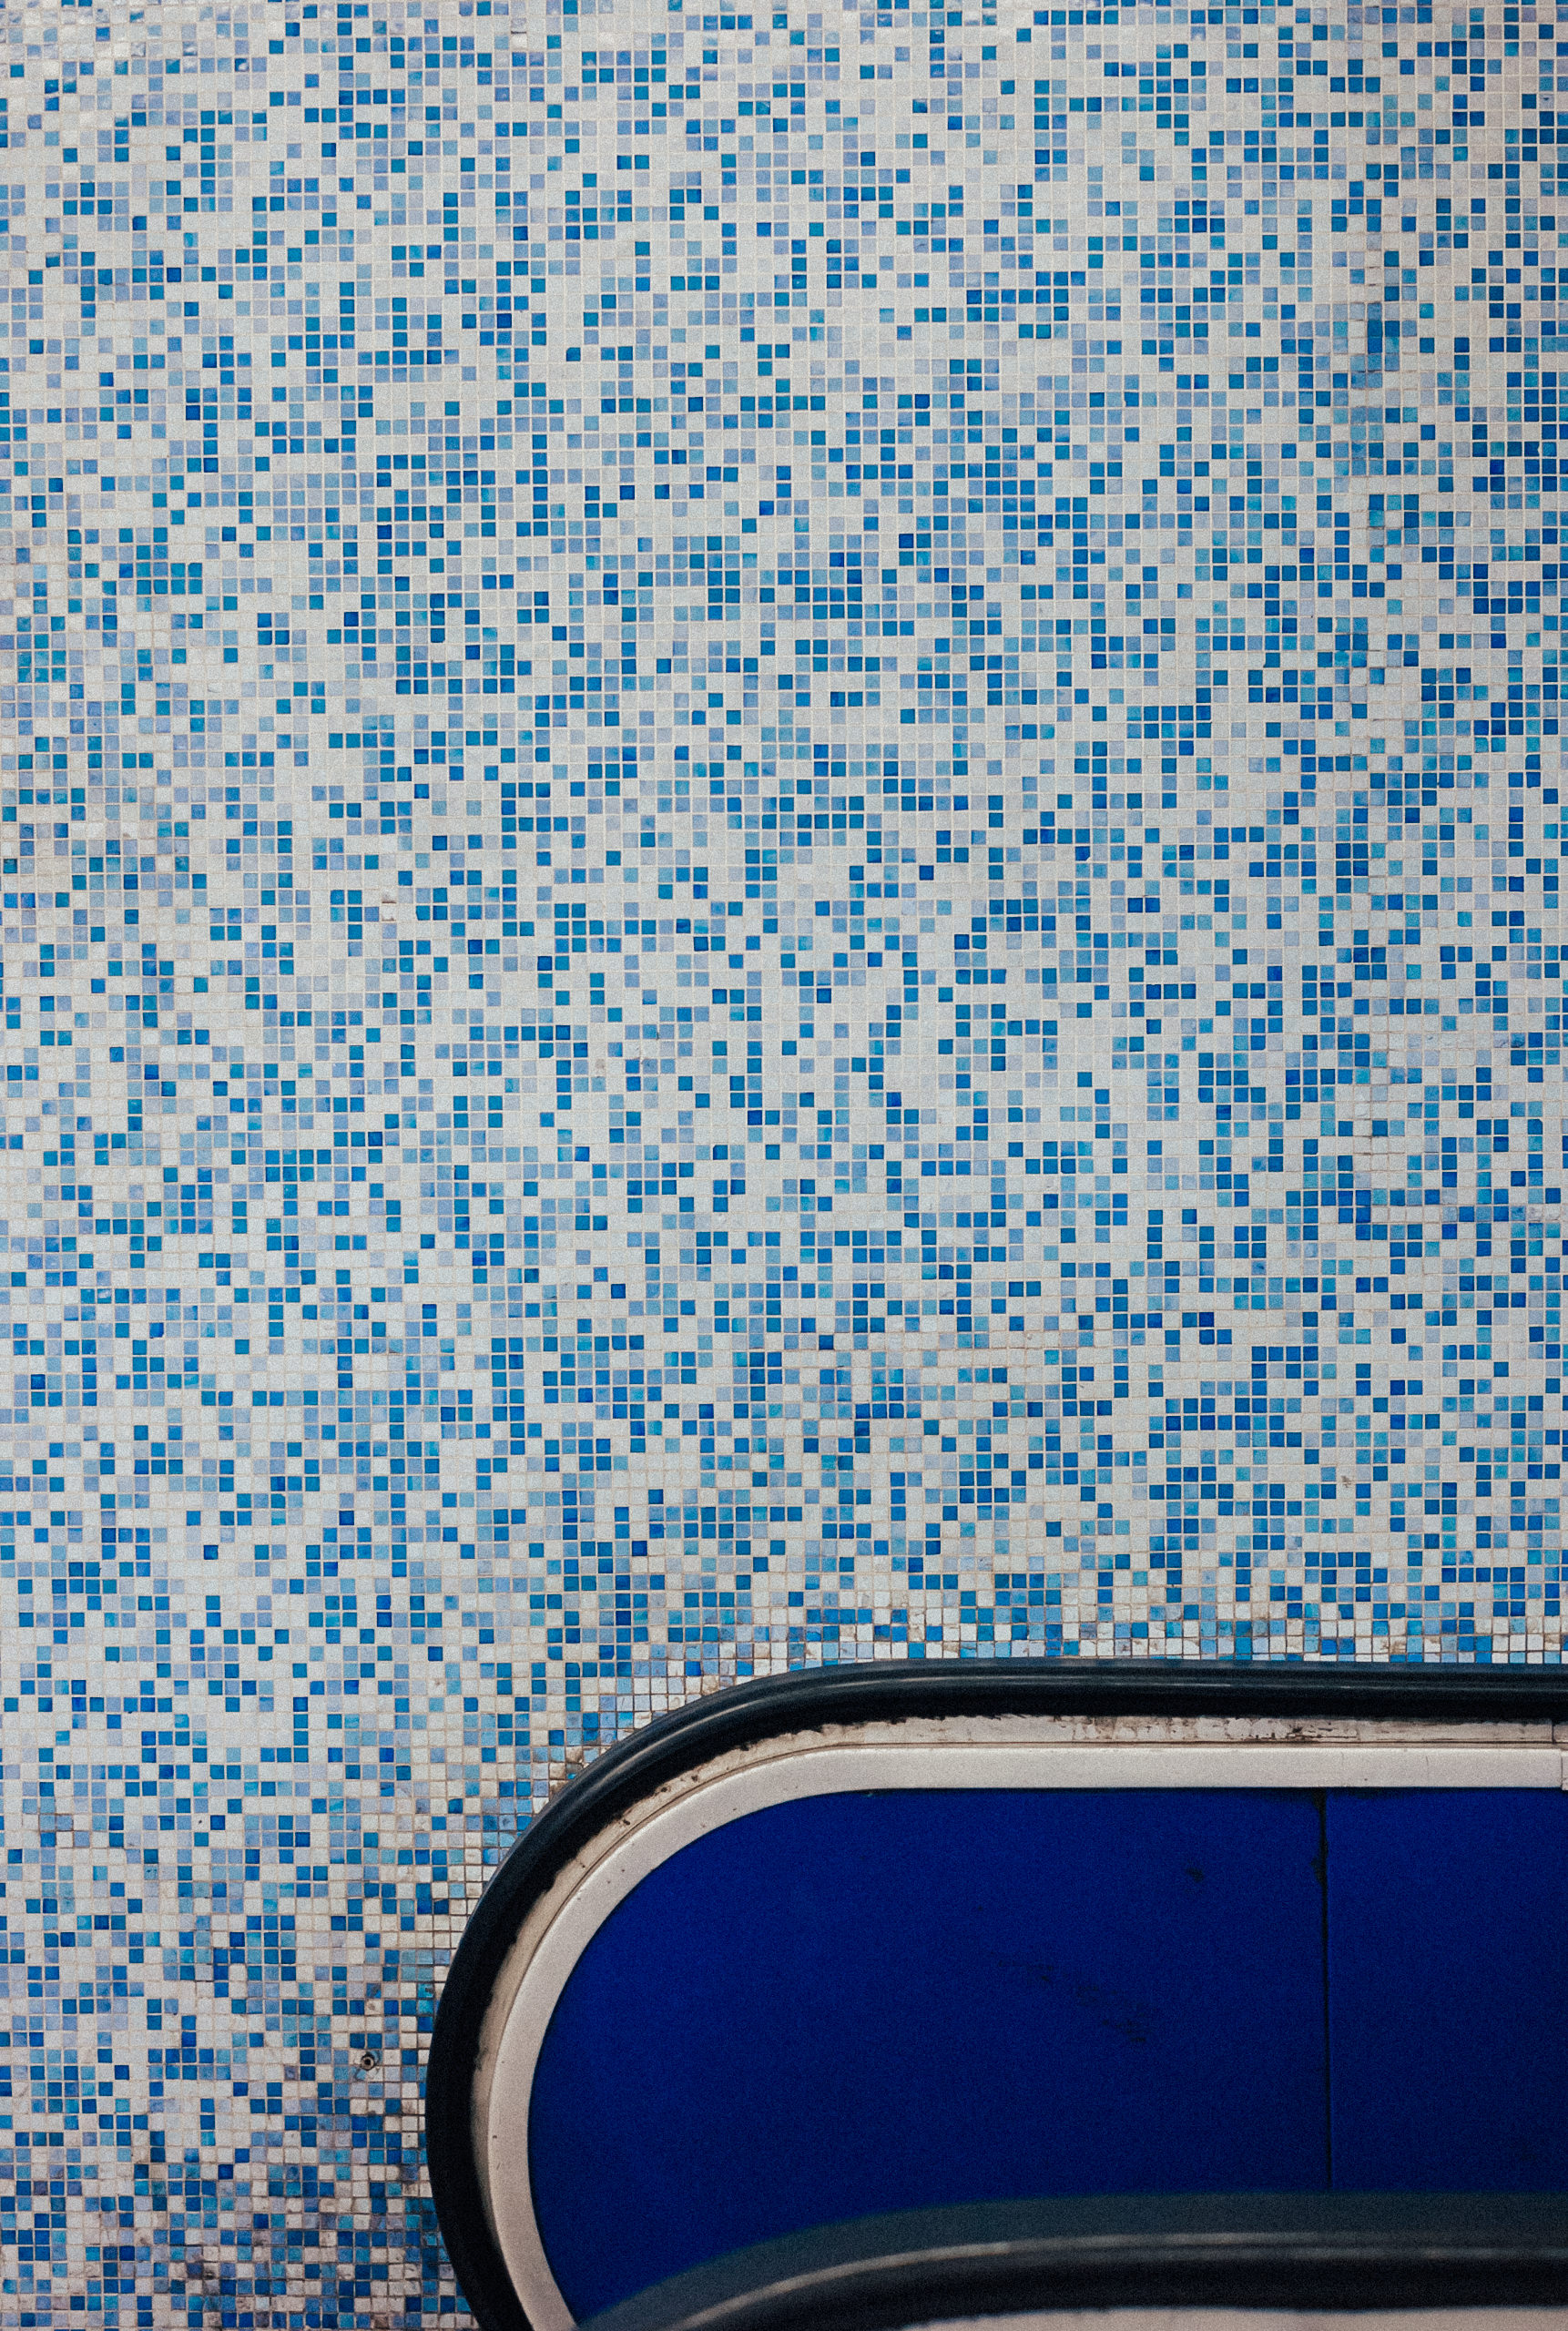 italy_travel_photography36.jpg